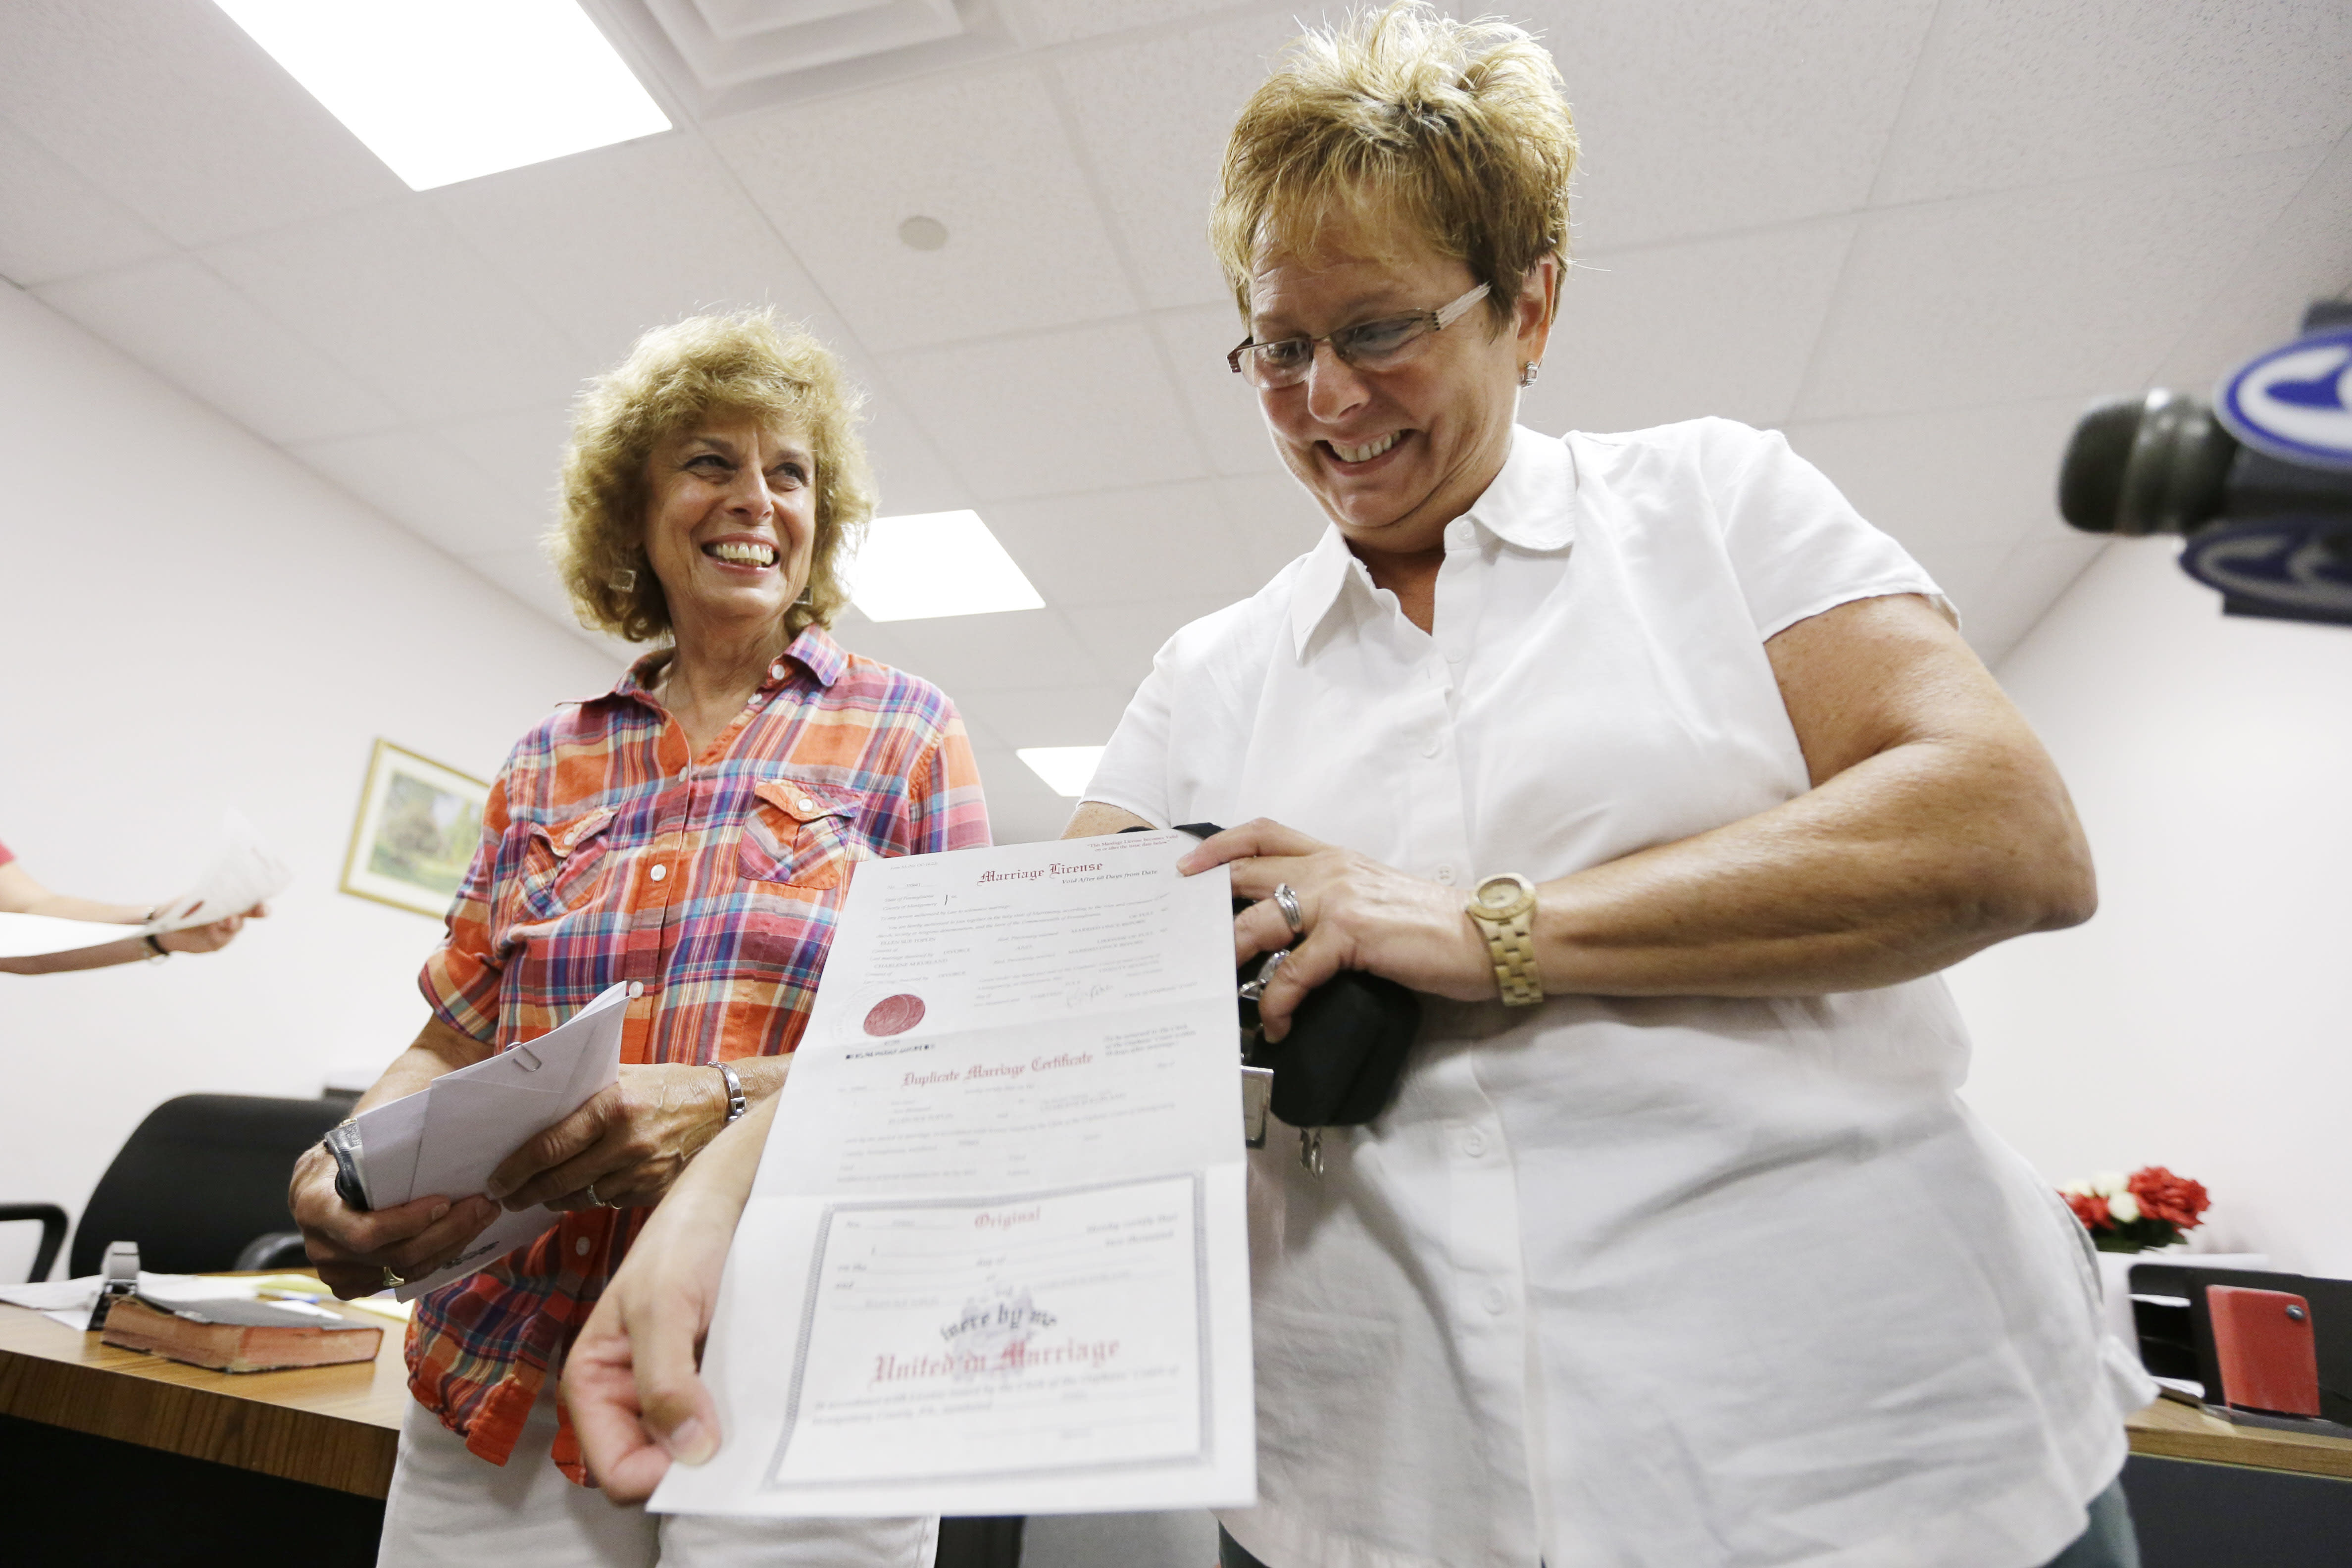 same sex unions vs marriage licenses in Northampton